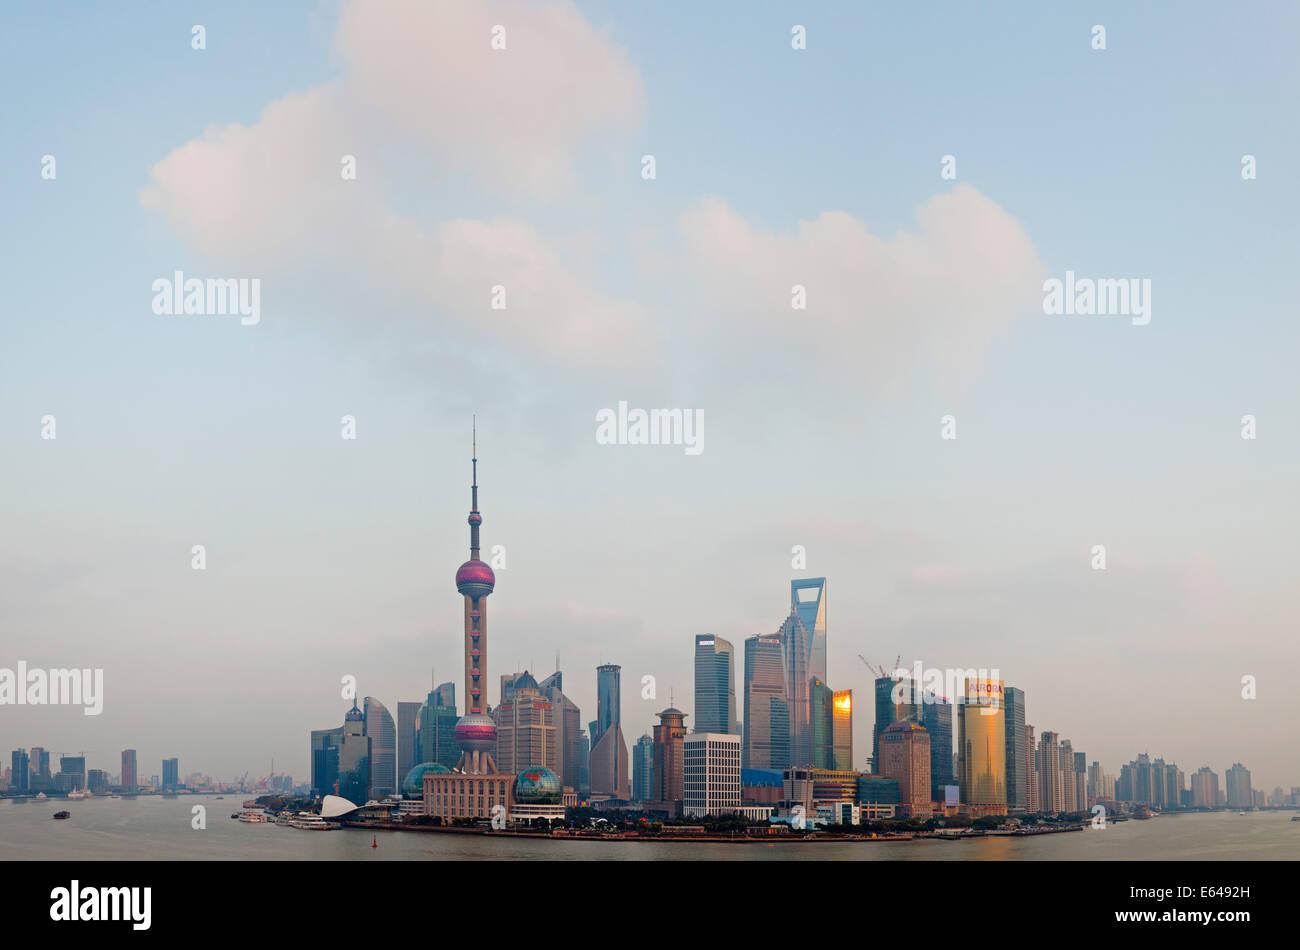 Pudong skyline & Huangpu River, Shanghai, China - Stock Image